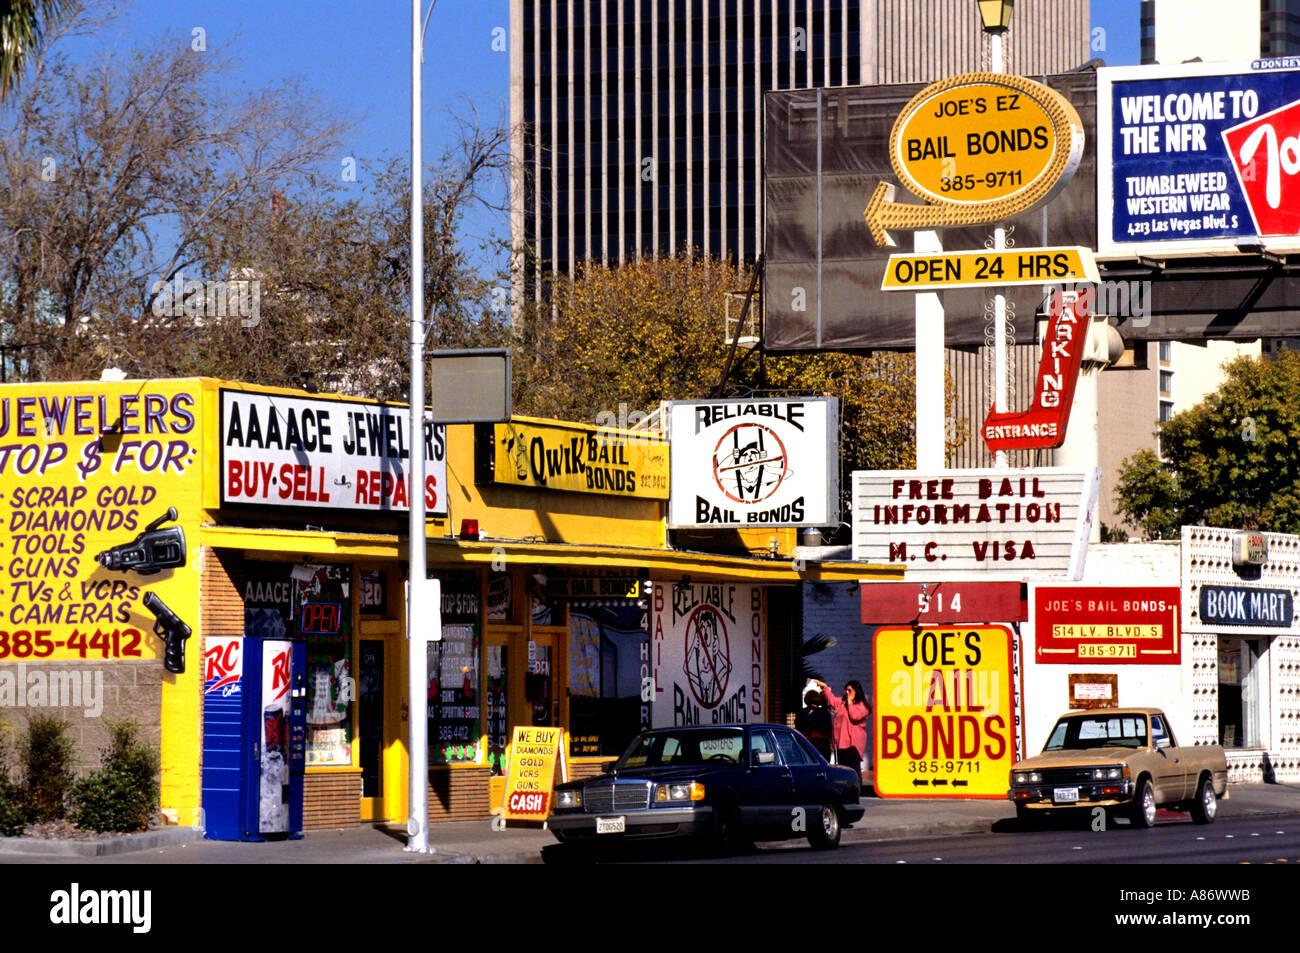 Bail bonds Pawn Shop Nevada Las Vegas Sell Buy  pawnbrokers - Stock Image